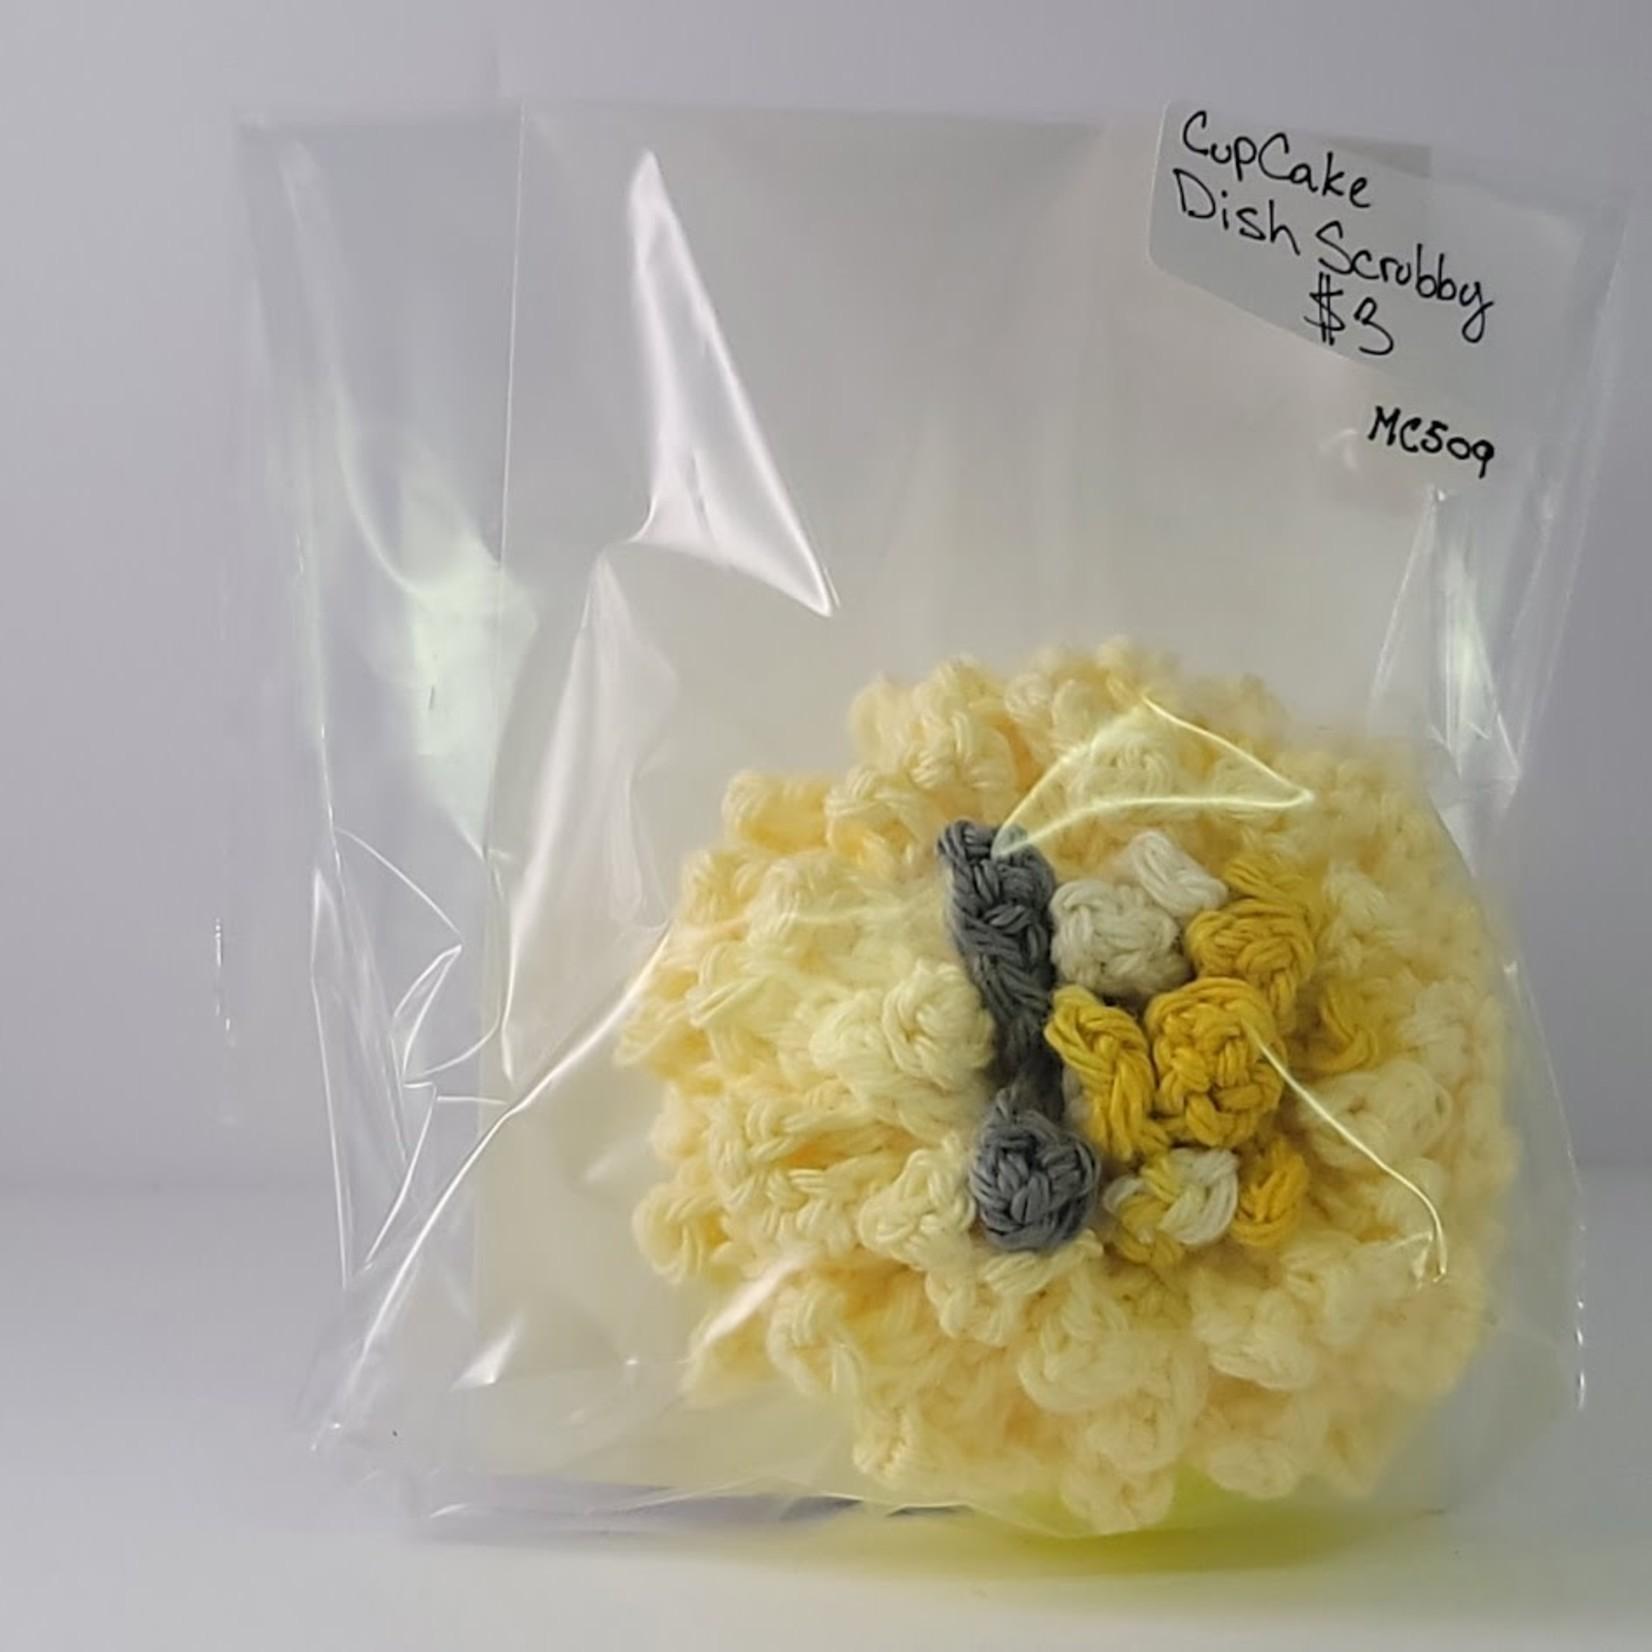 Marjielous Creations Cupcake Dish Scrubby